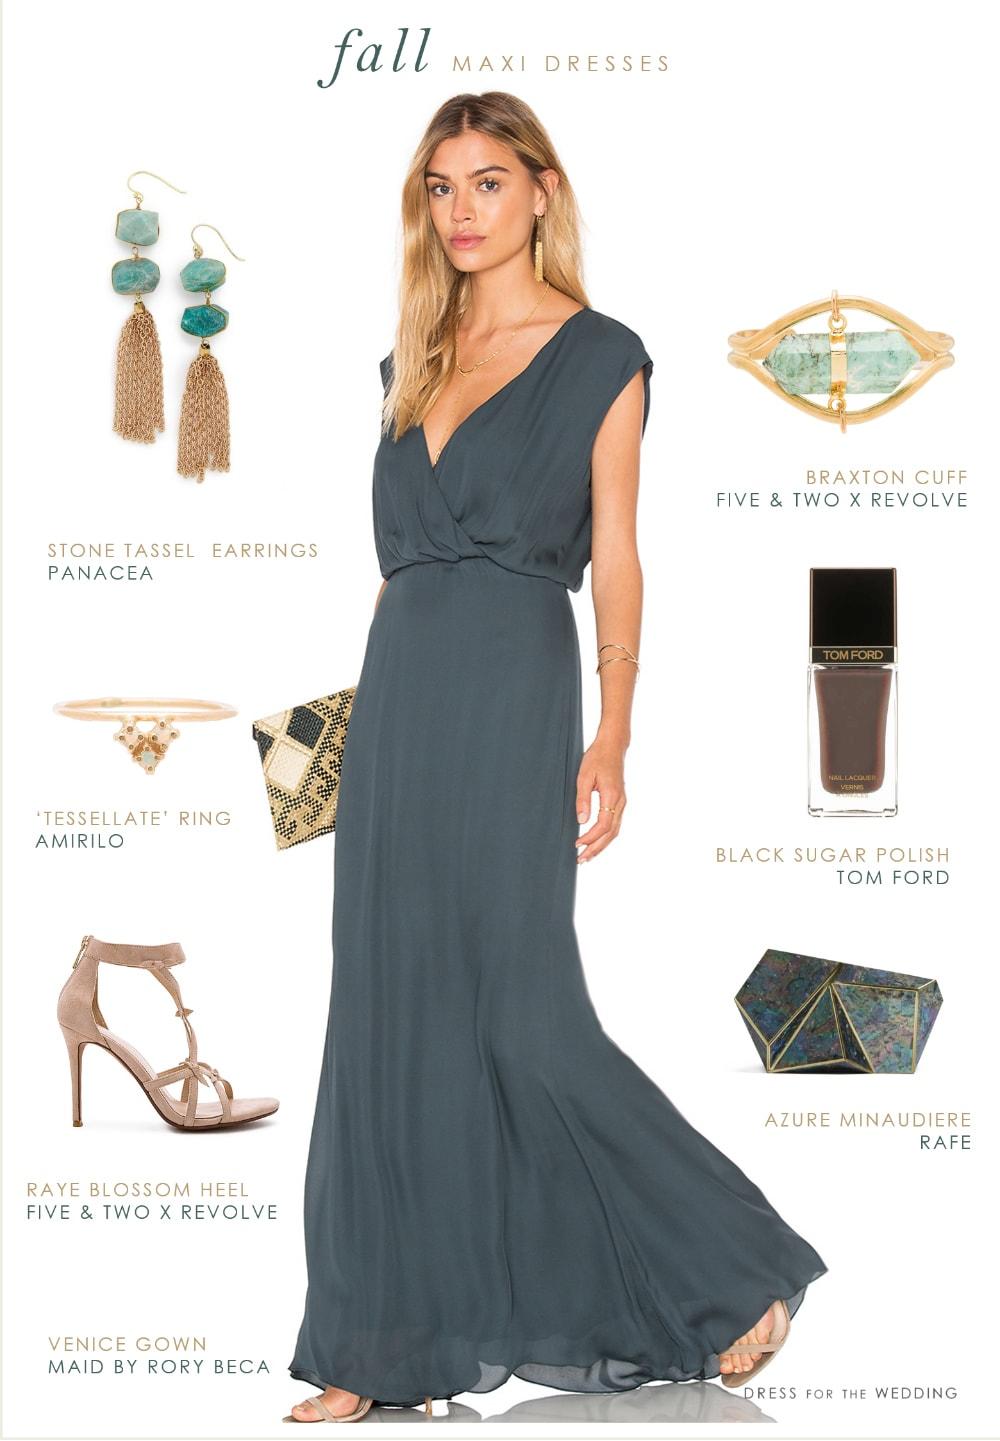 maxi dresses for fall fall dresses for wedding Maxi dresses for fall